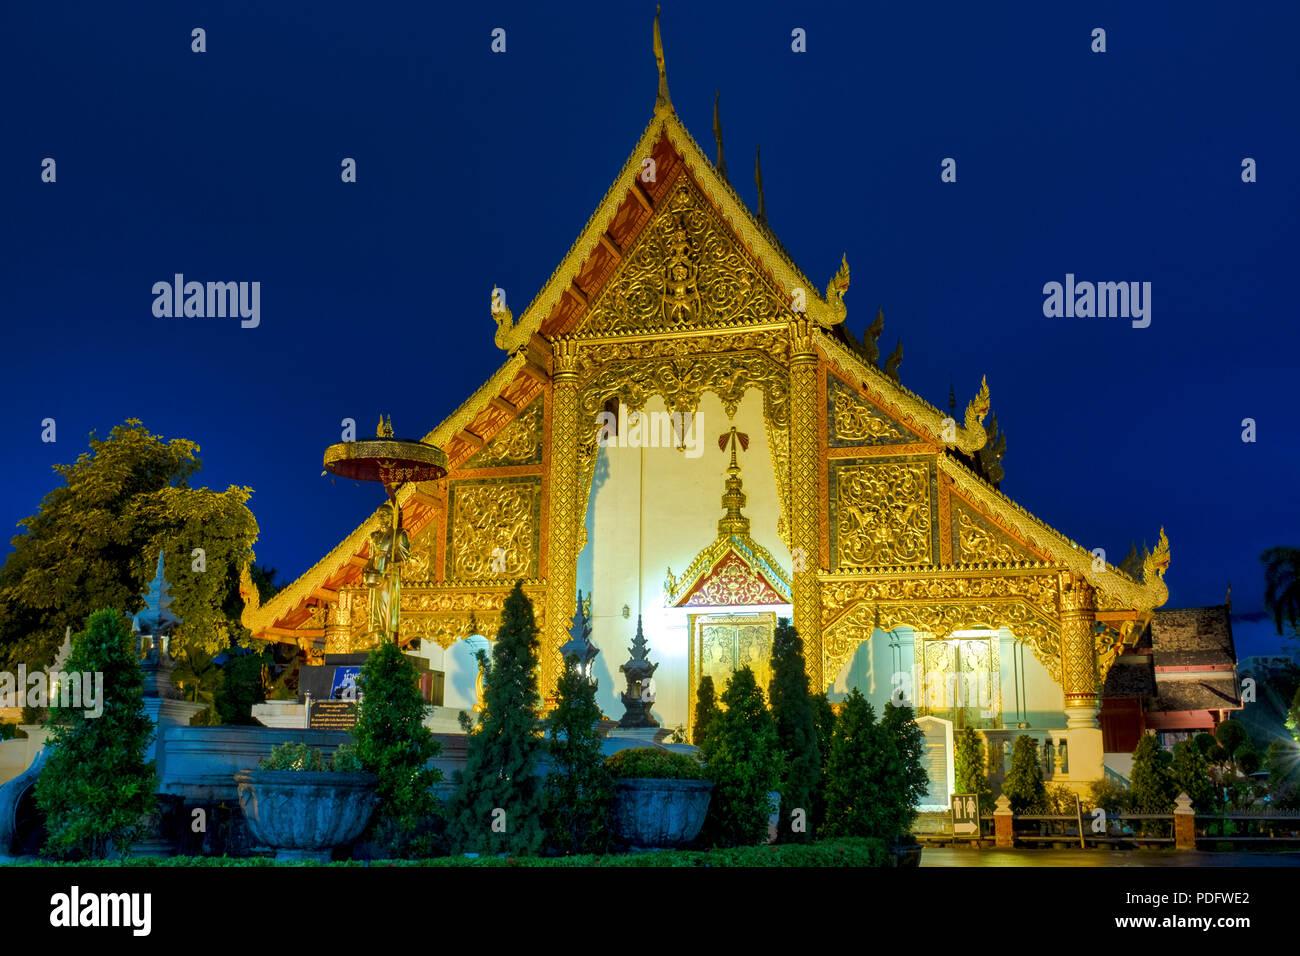 Wihan Luang of Wat Phra Singh, Chiang Mai, Thailand Stock Photo